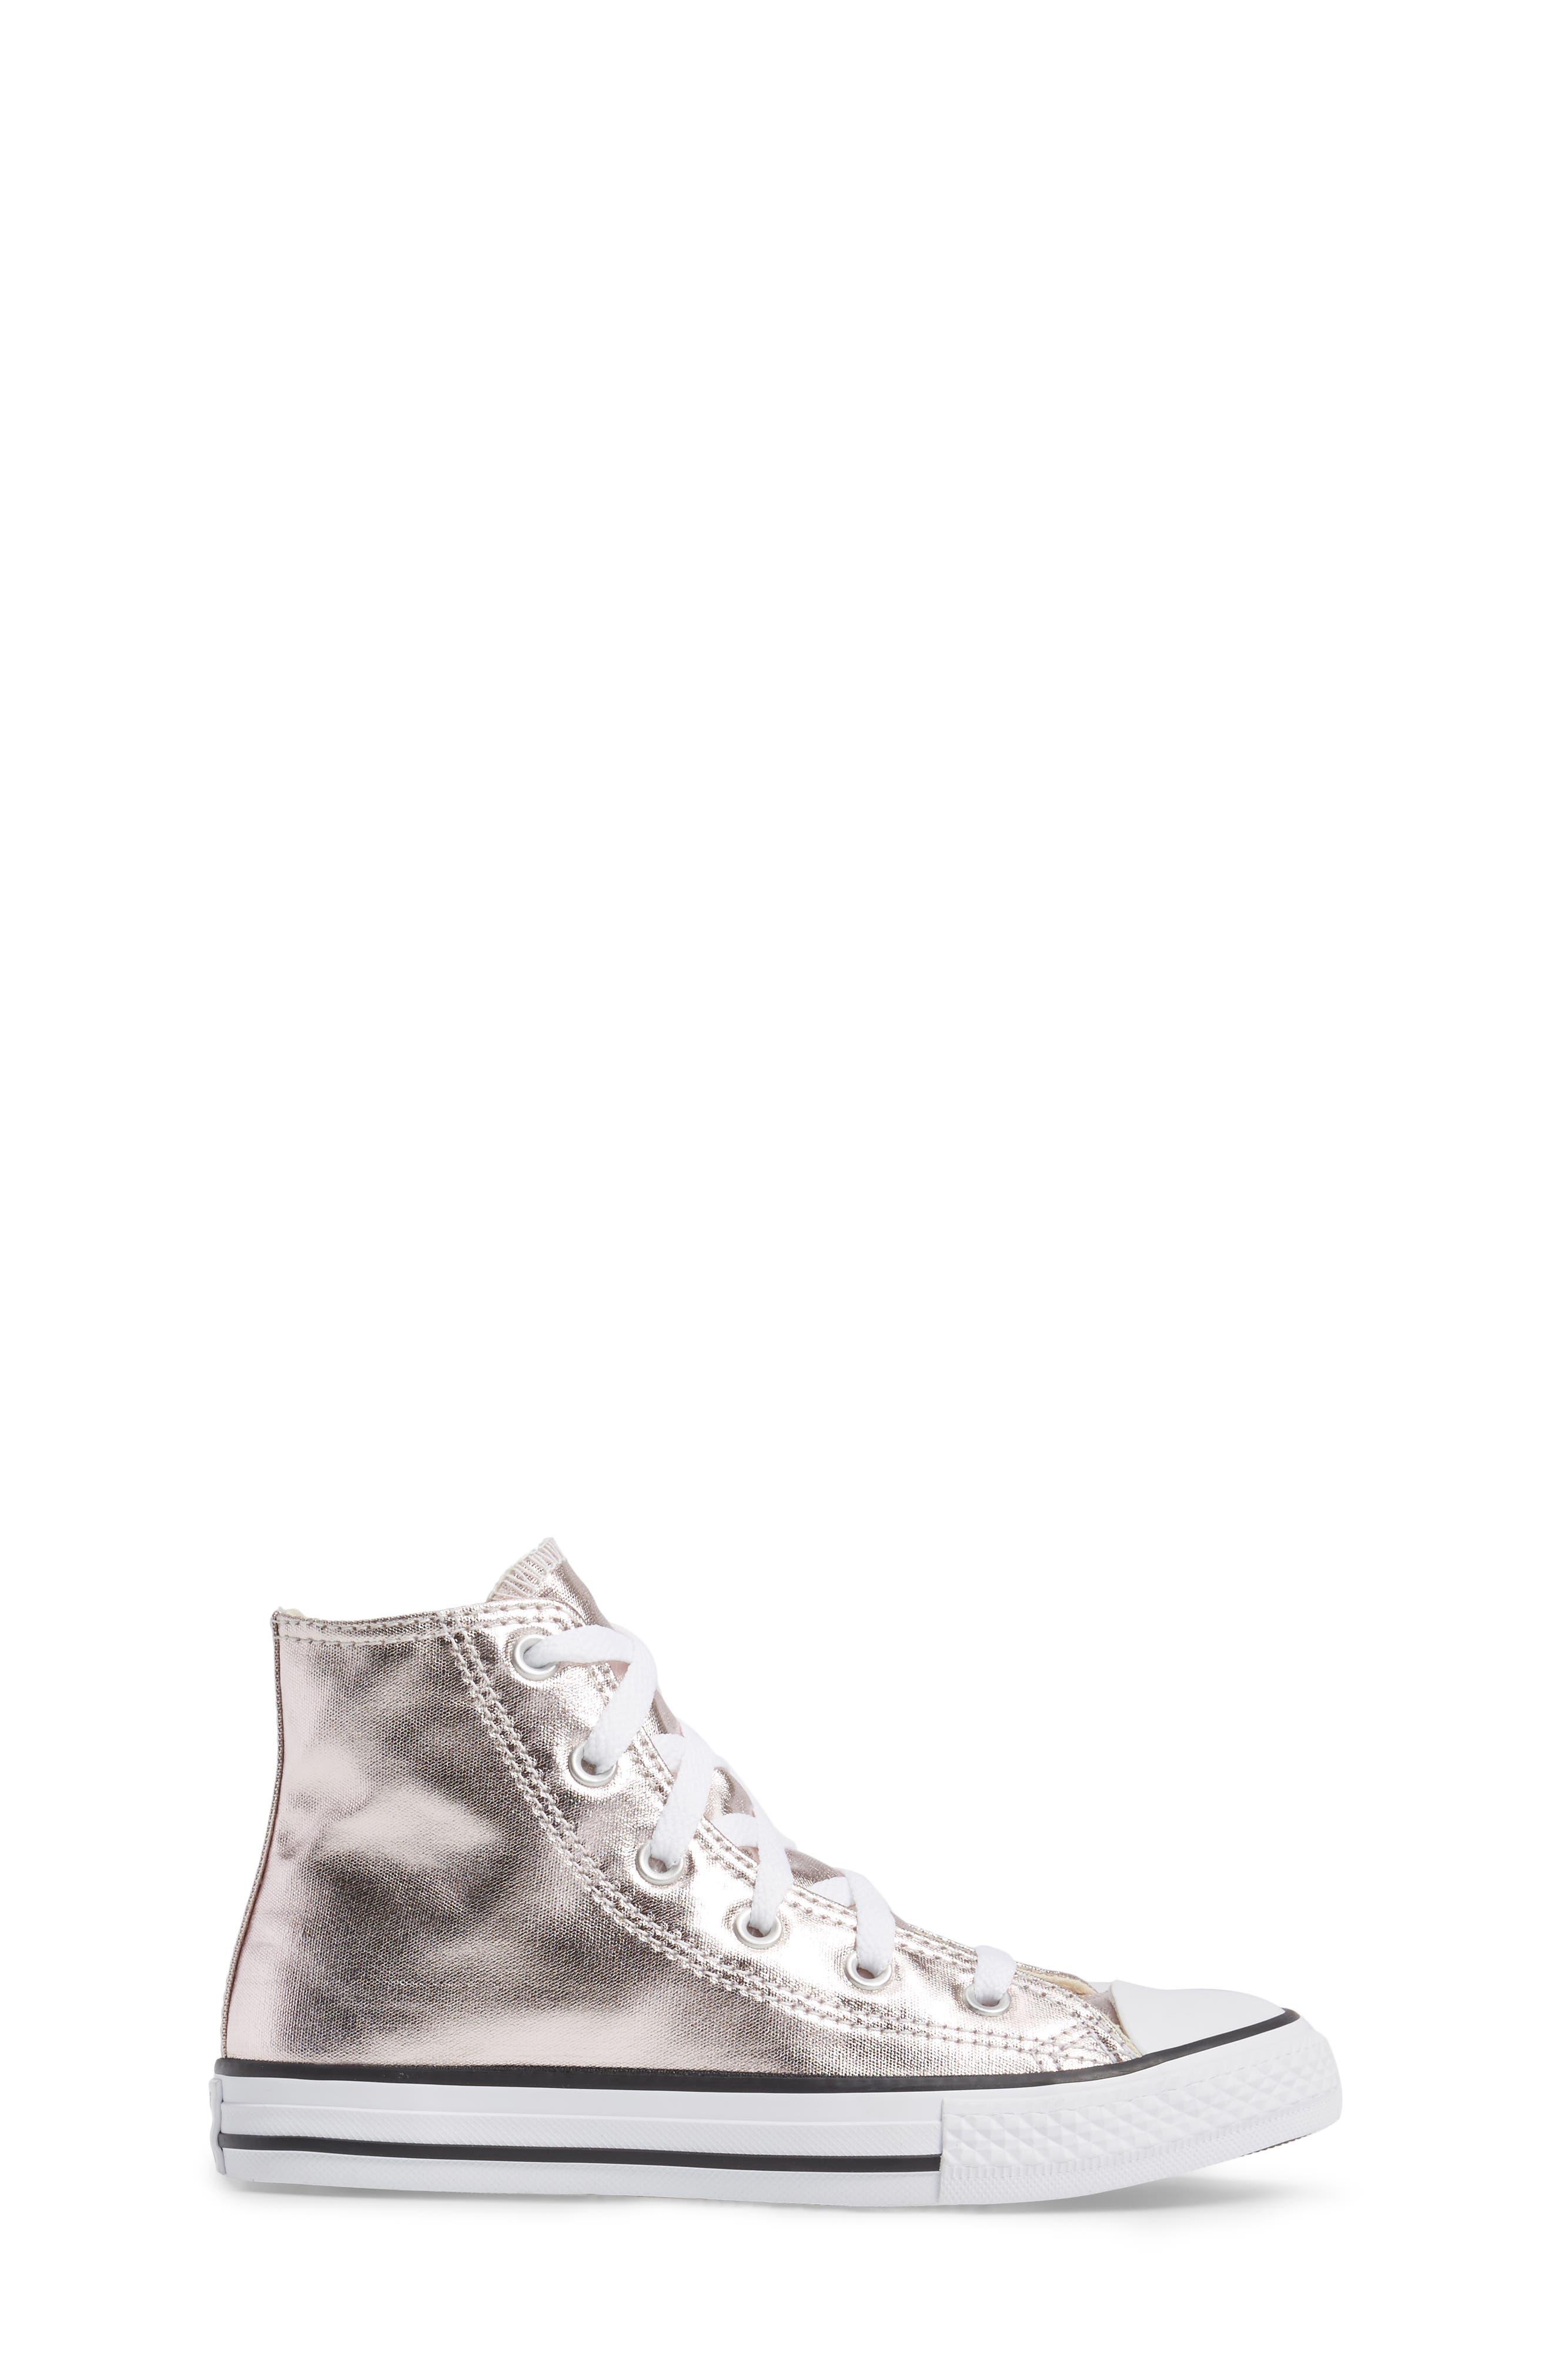 Chuck Taylor<sup>®</sup> All Star<sup>®</sup> Seasonal Metallic High Top Sneaker,                             Alternate thumbnail 3, color,                             Rose Quartz/ White Canvas